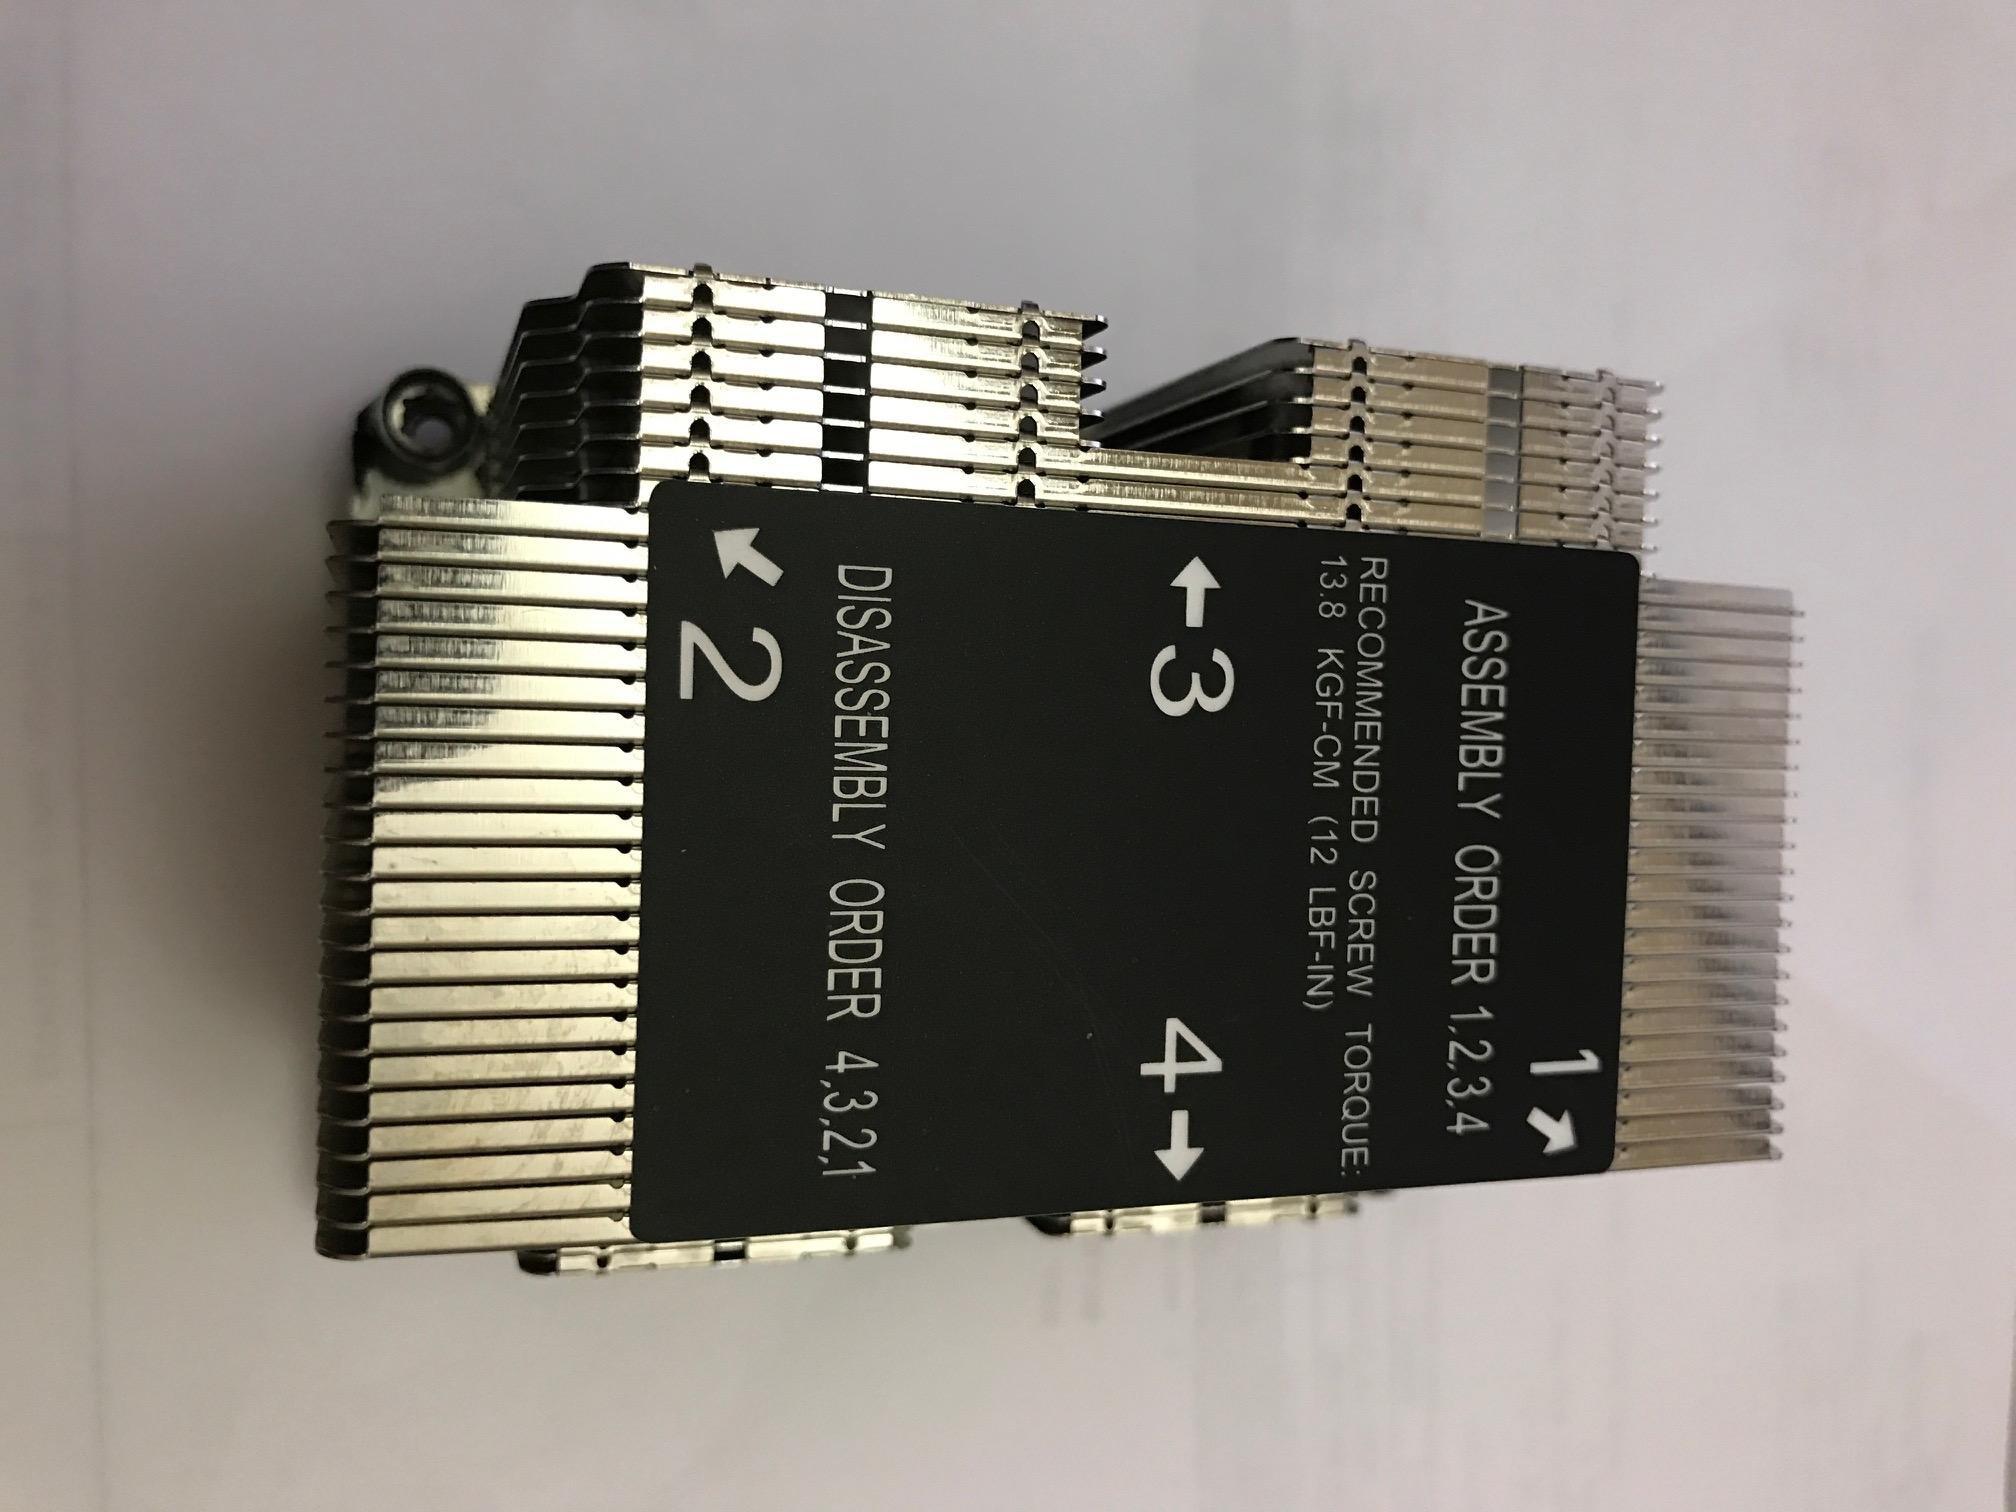 Supermicro SNK-P0068PSC LGA 3647-0 2U &UP X11 Purley Platform CPU Heat Sink